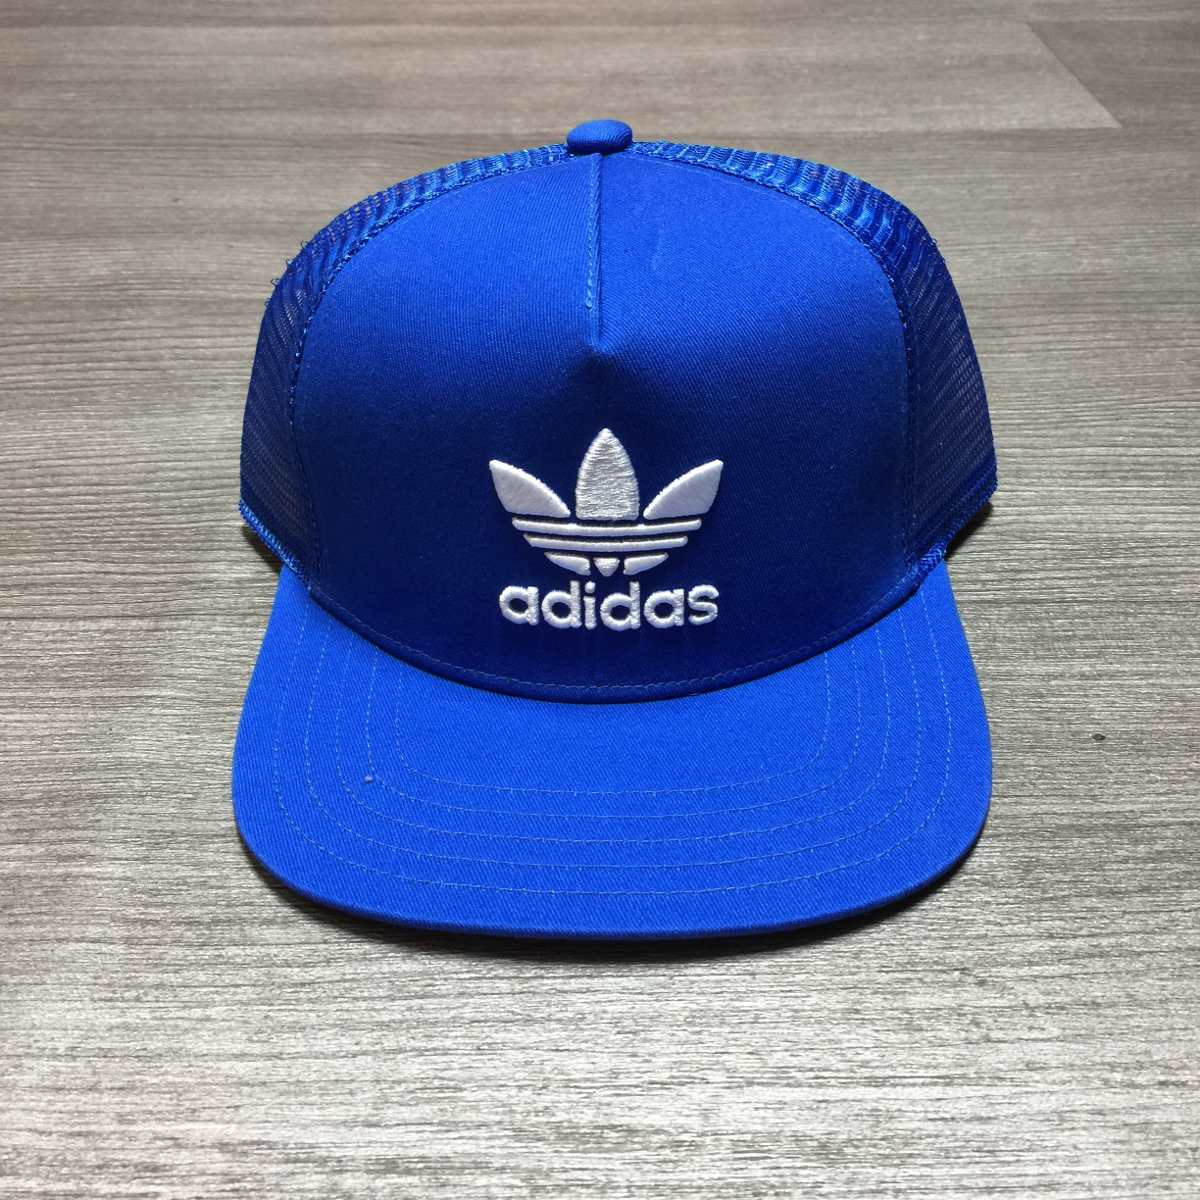 6274a6c028d2d gorras de adidas azul